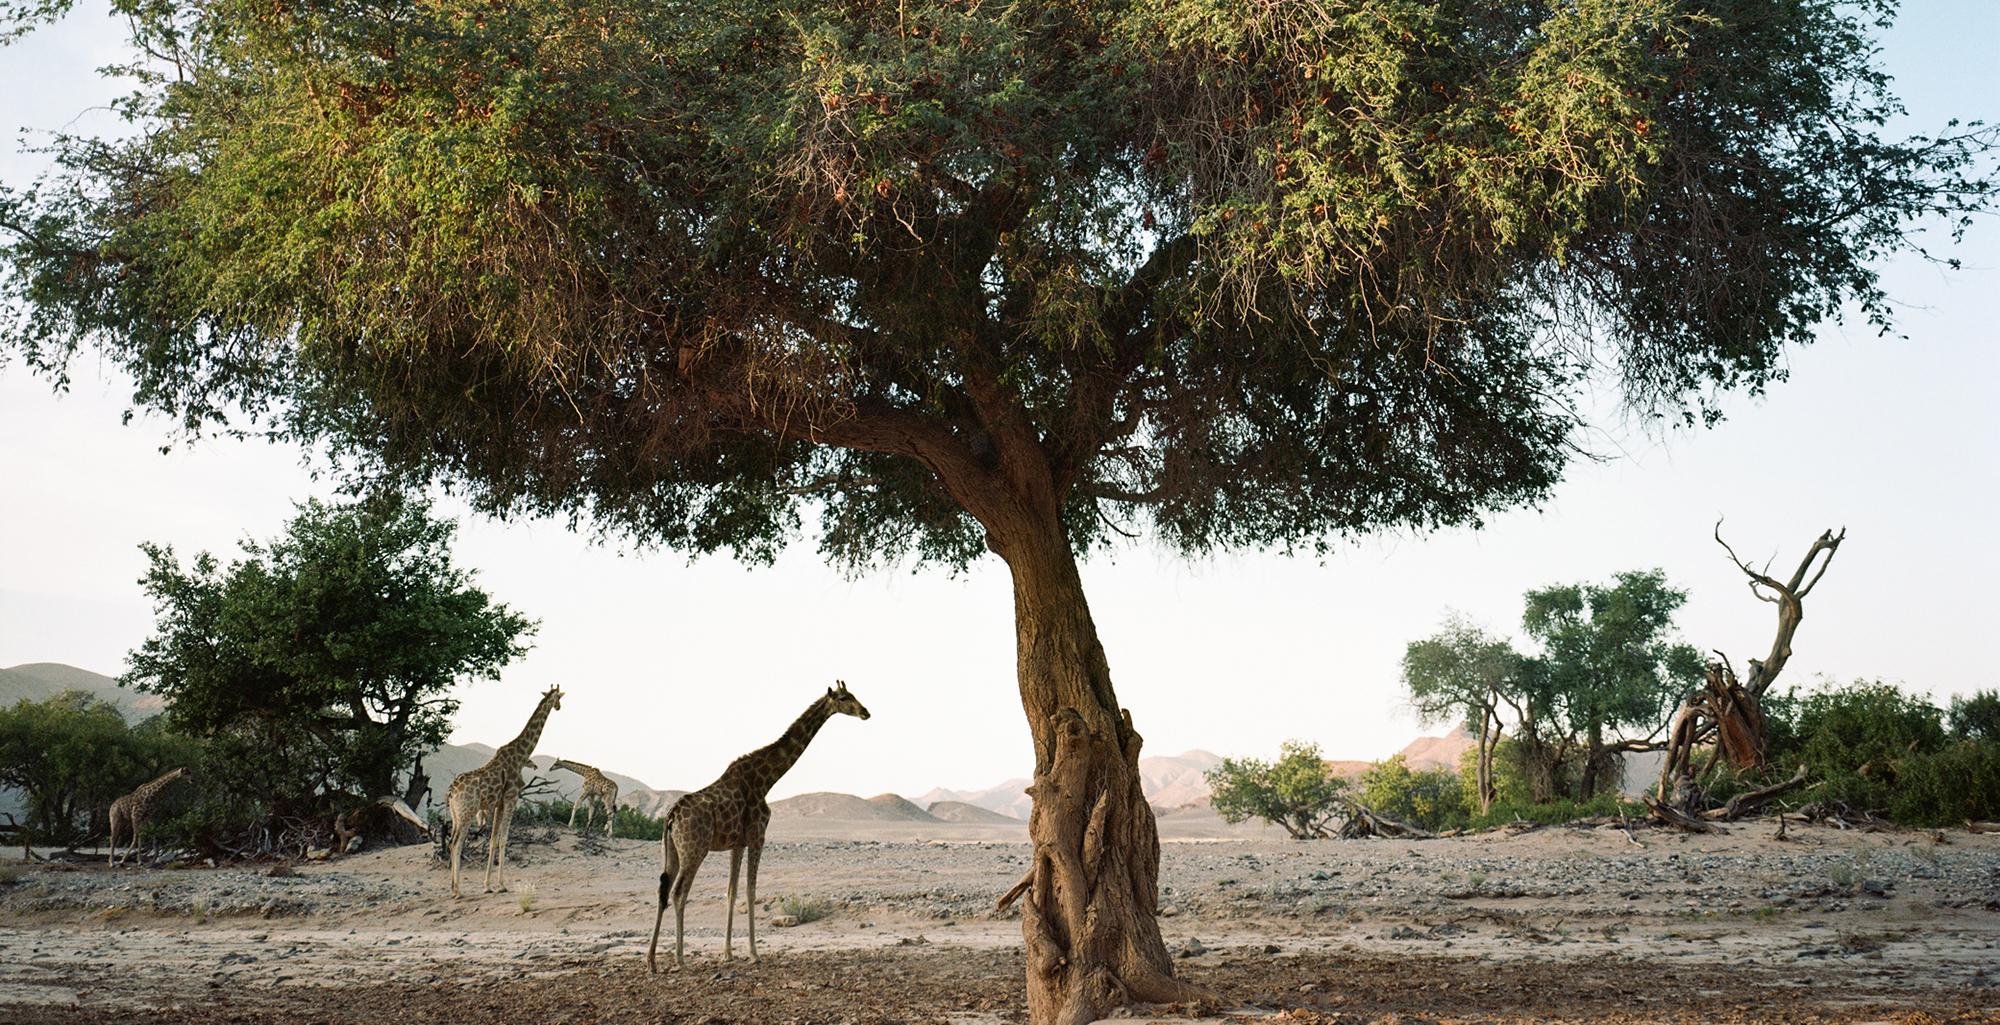 Namibia-Kaokoland-Wildlife-Giraffe